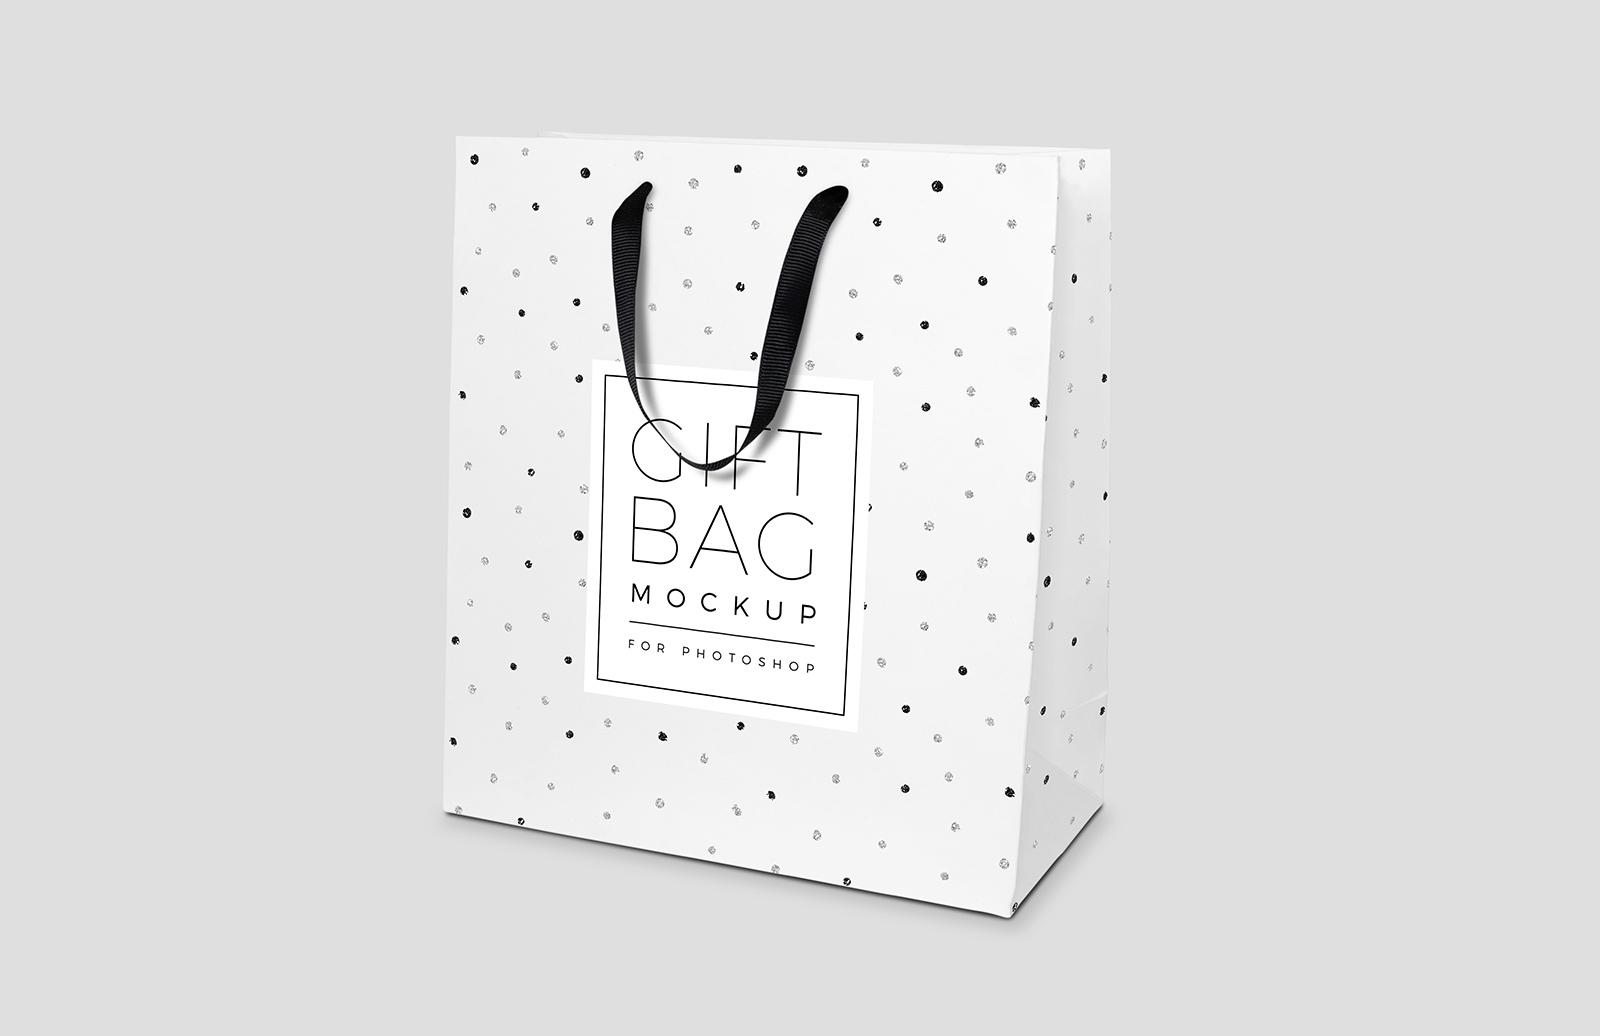 Gift Bag Mockup for Photoshop